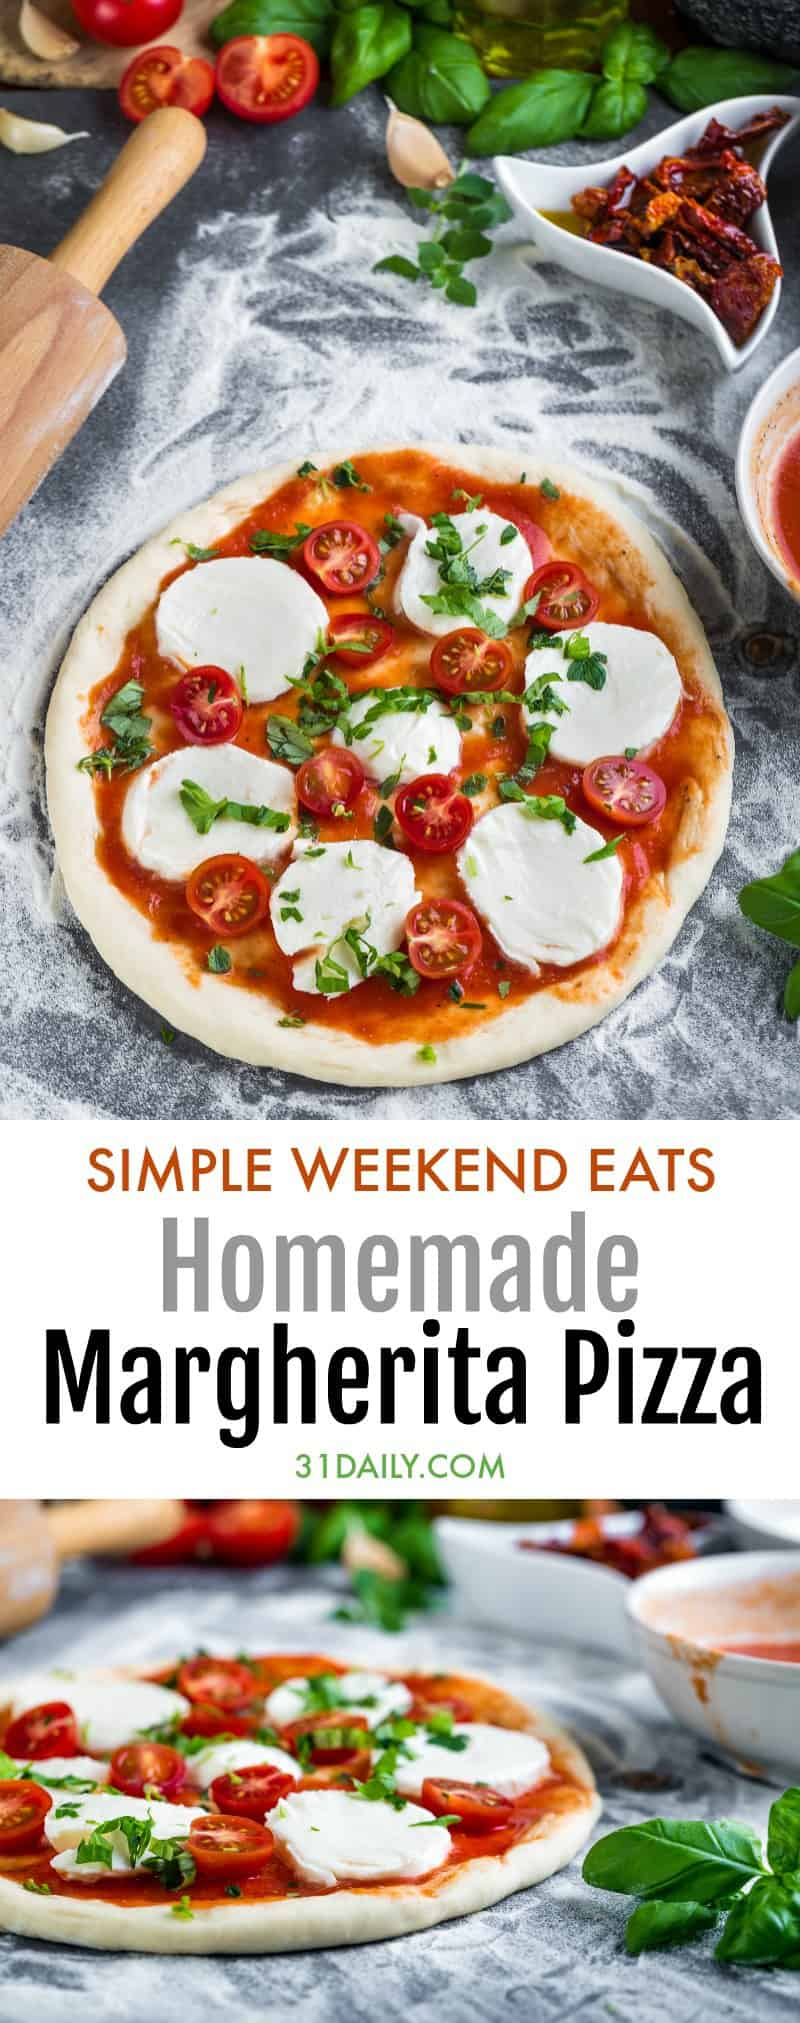 Homemade Margherita Pizza Recipe: Simple Weekend Eats | 31Daily.com